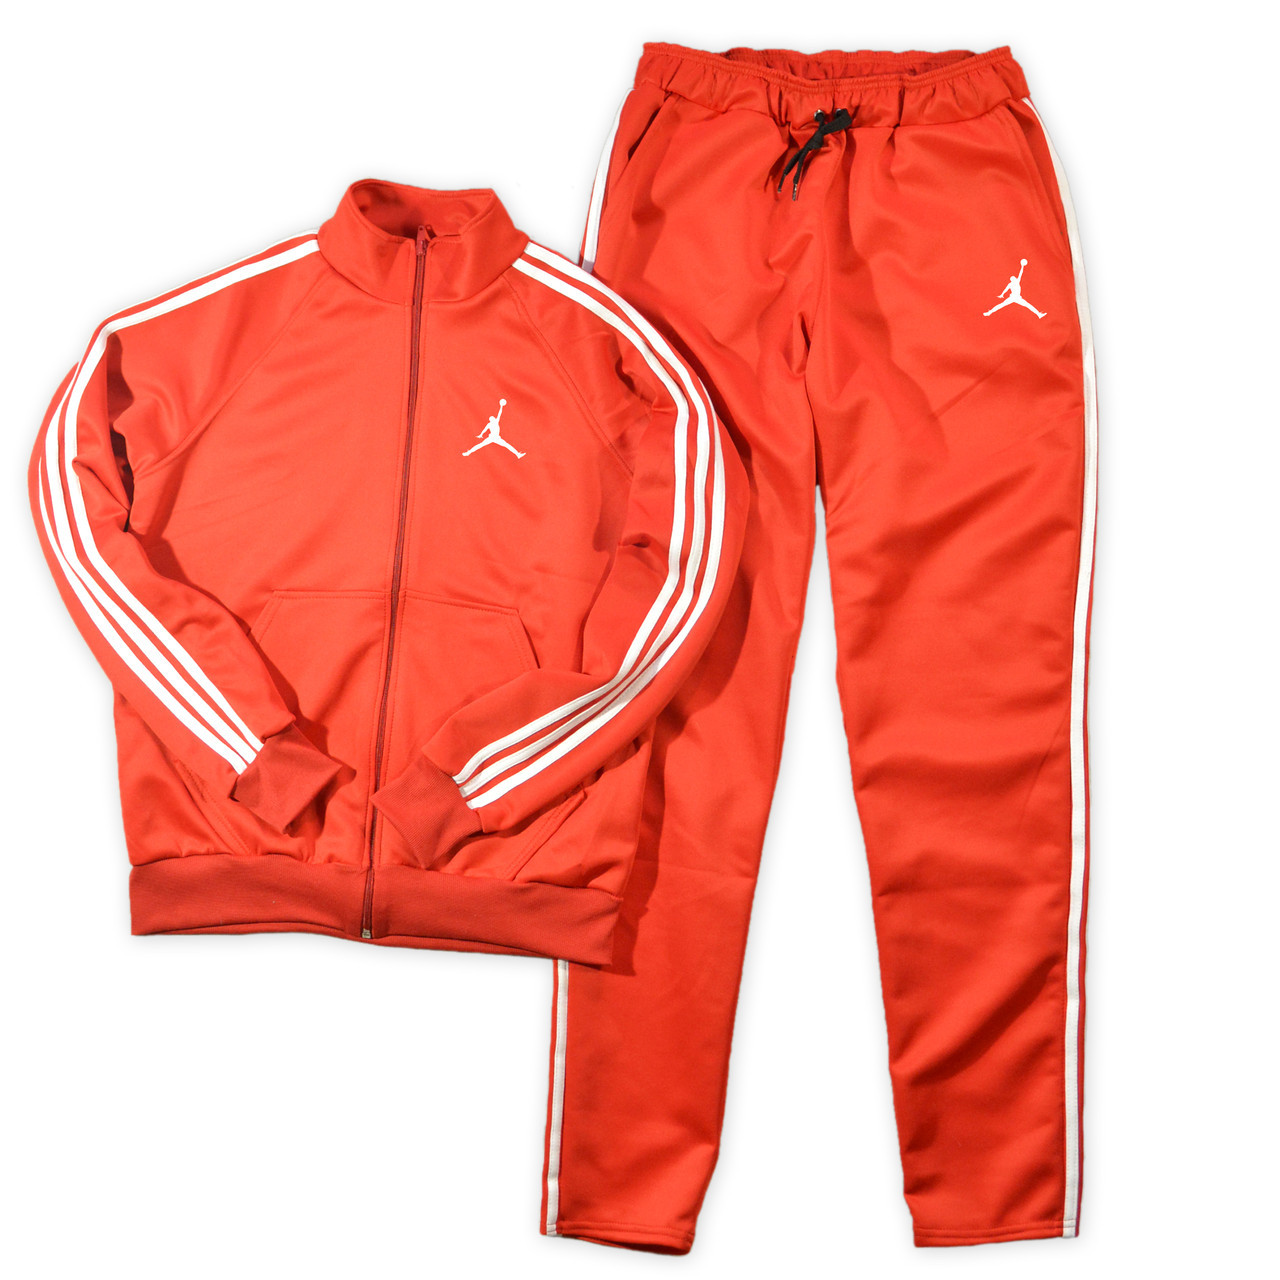 f3f87338e9a0 Спортивный костюм Jordan (Джордан) - Эластика, весна-лето, S - Спортивный